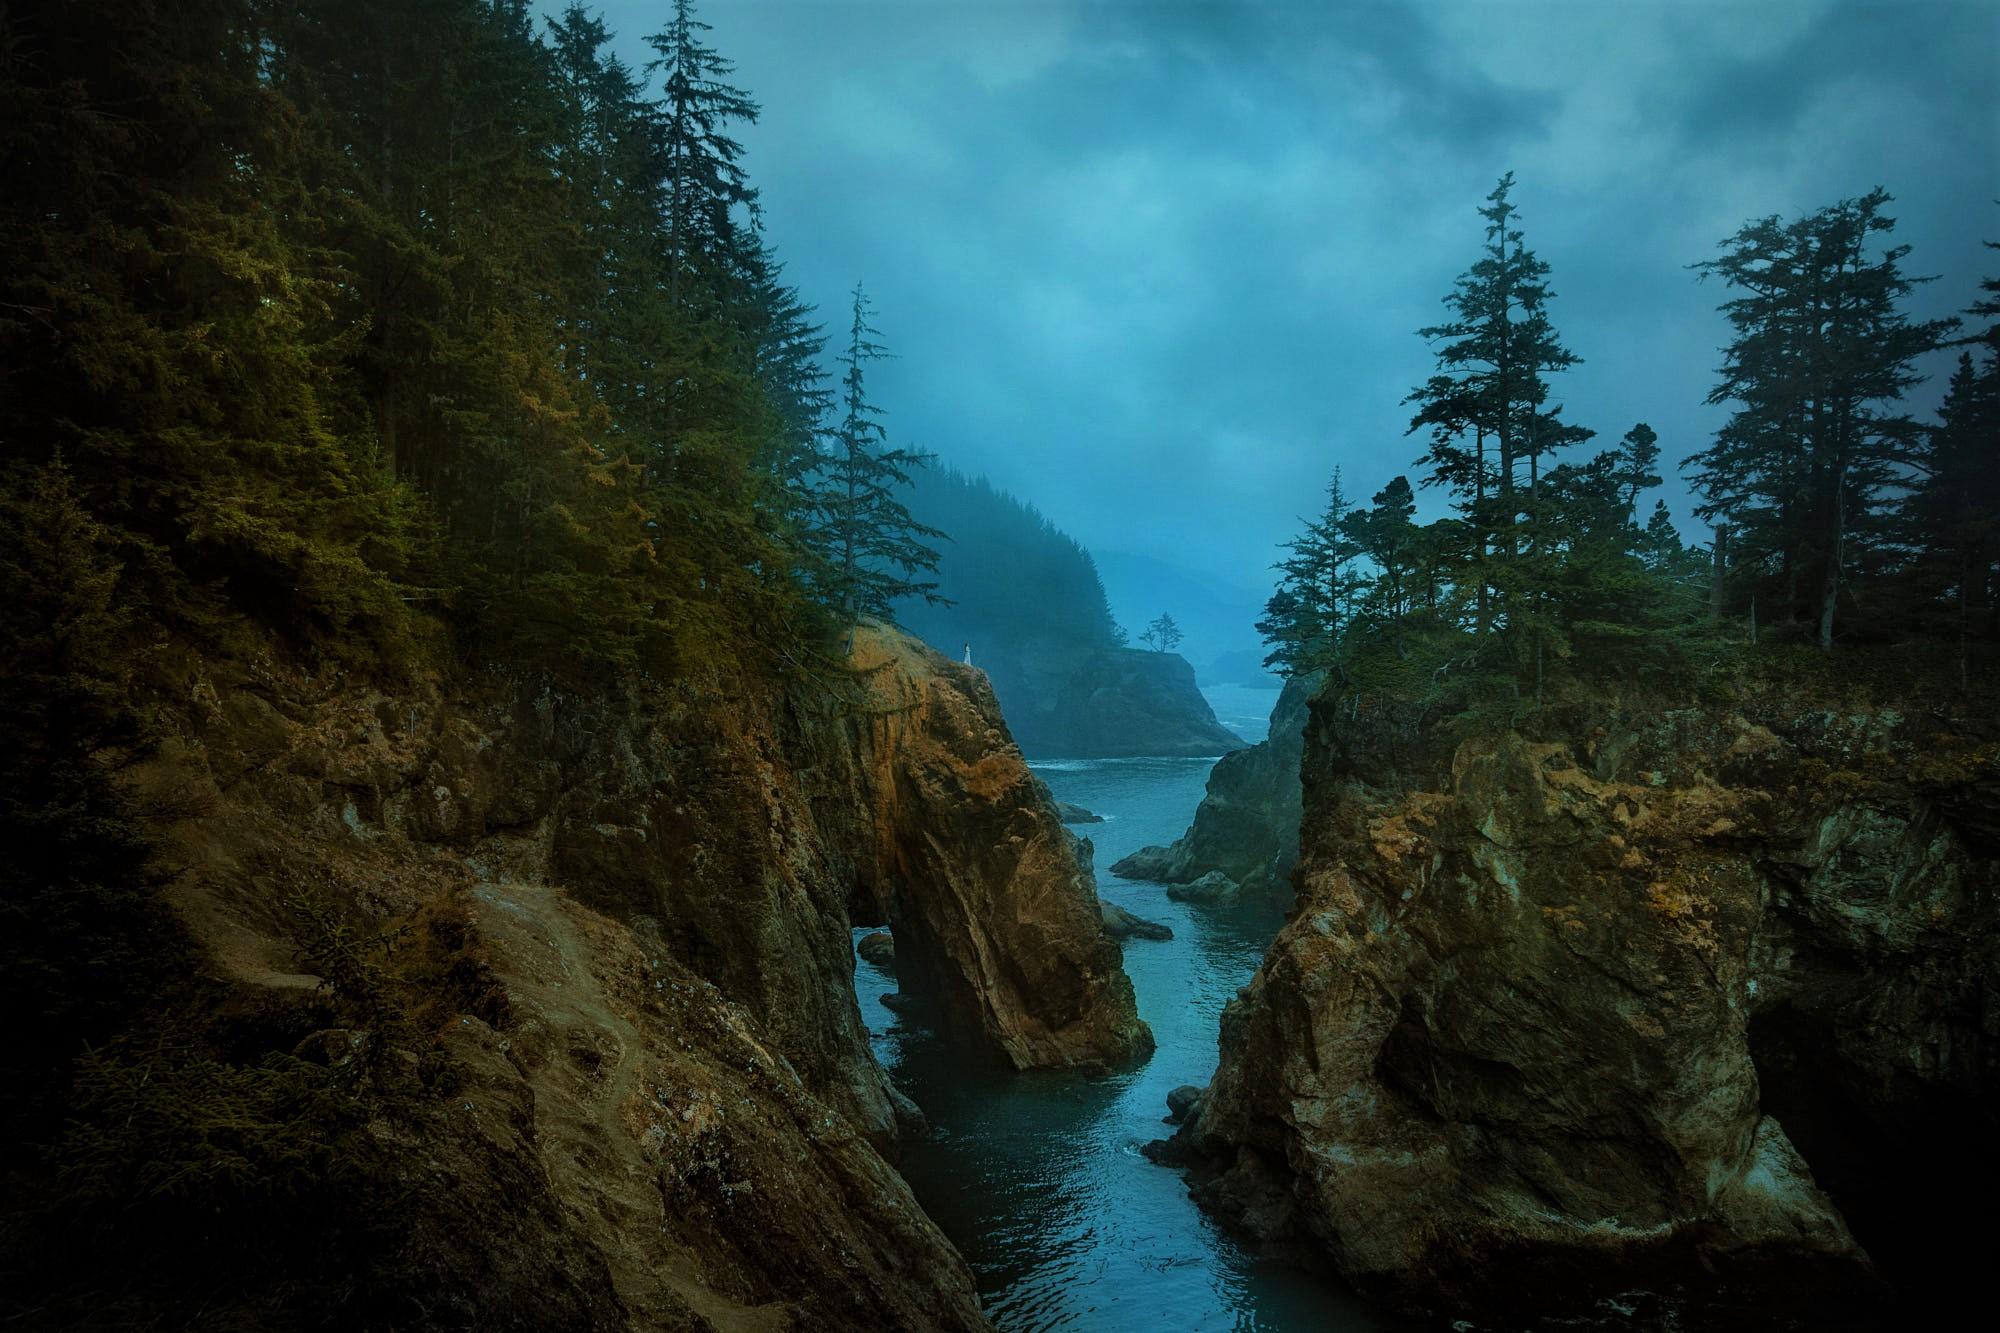 Samuel h boardman state park in oregon usa hd wallpaper - Oregon nature wallpaper ...